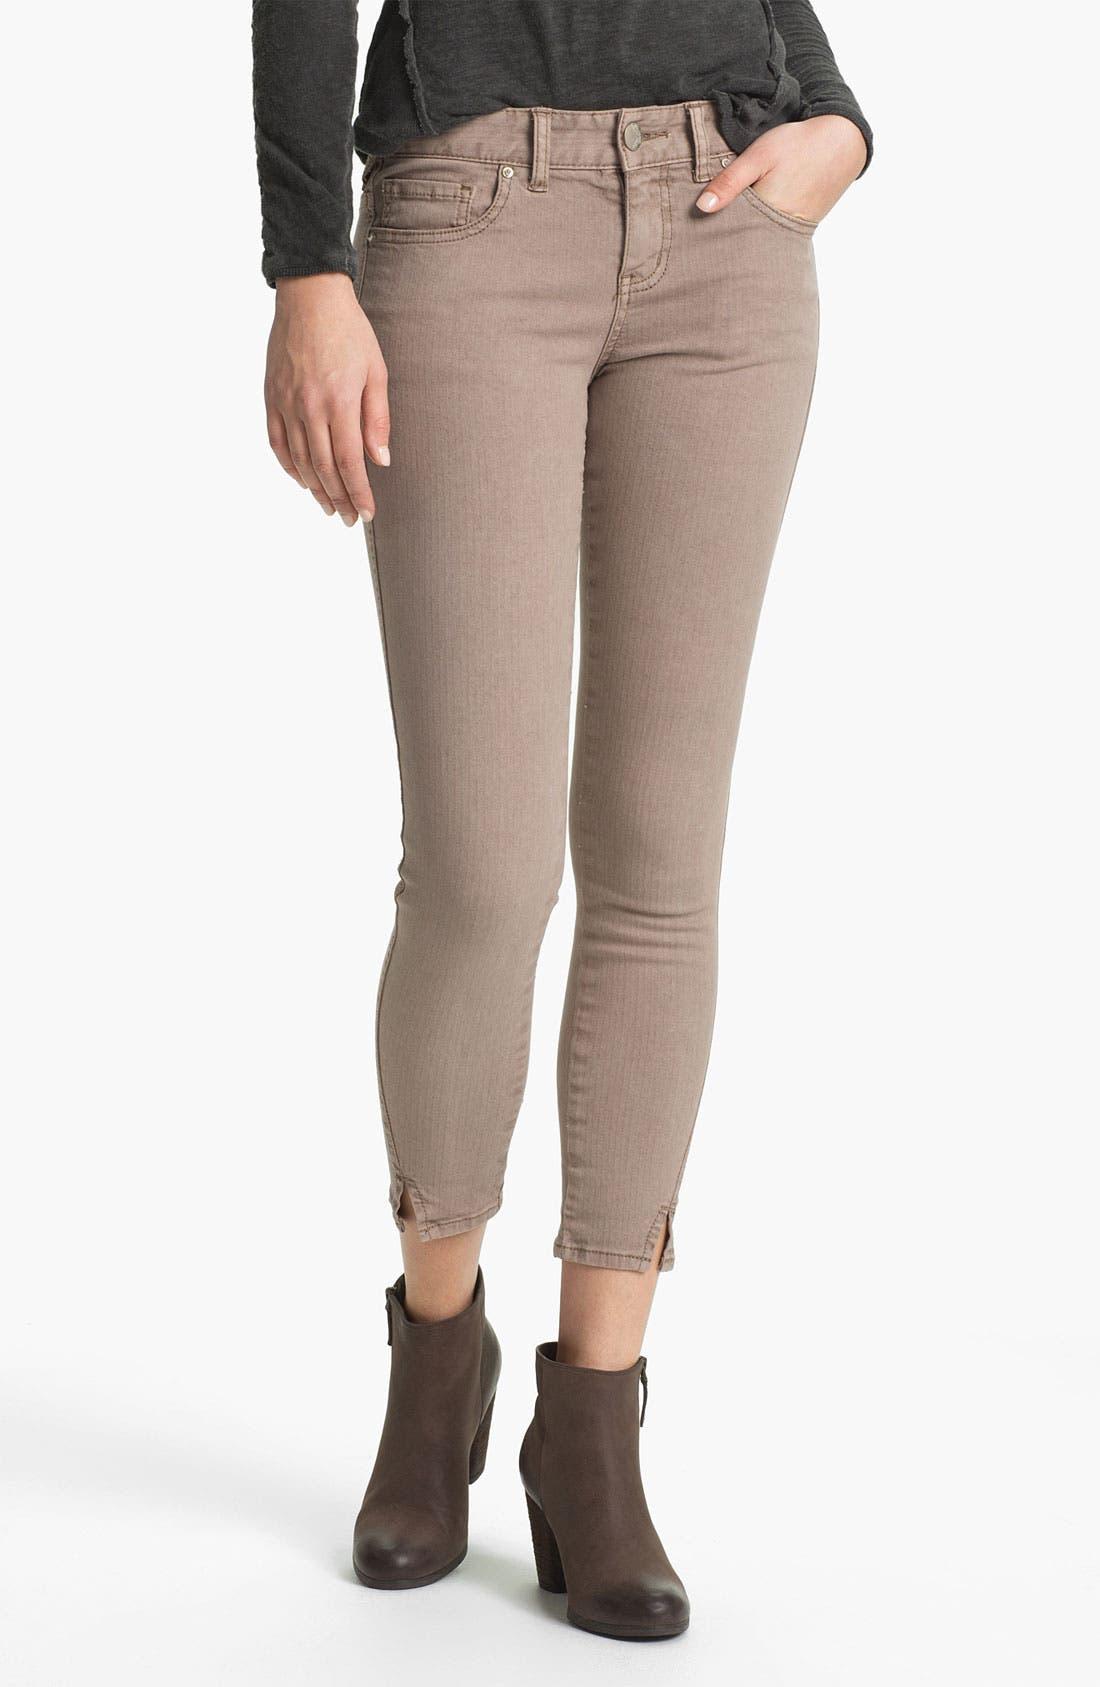 Alternate Image 1 Selected - Free People Crop Stretch Denim Skinny Jeans (Liza)